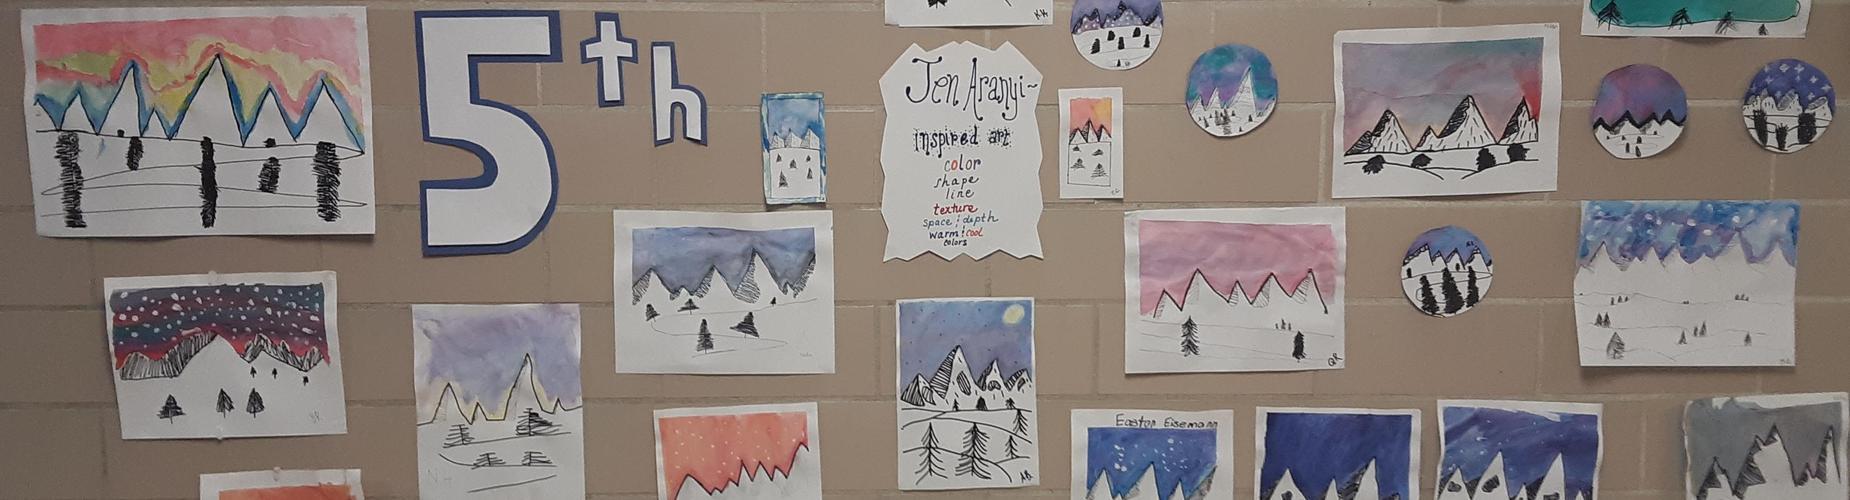 upper elementary school work